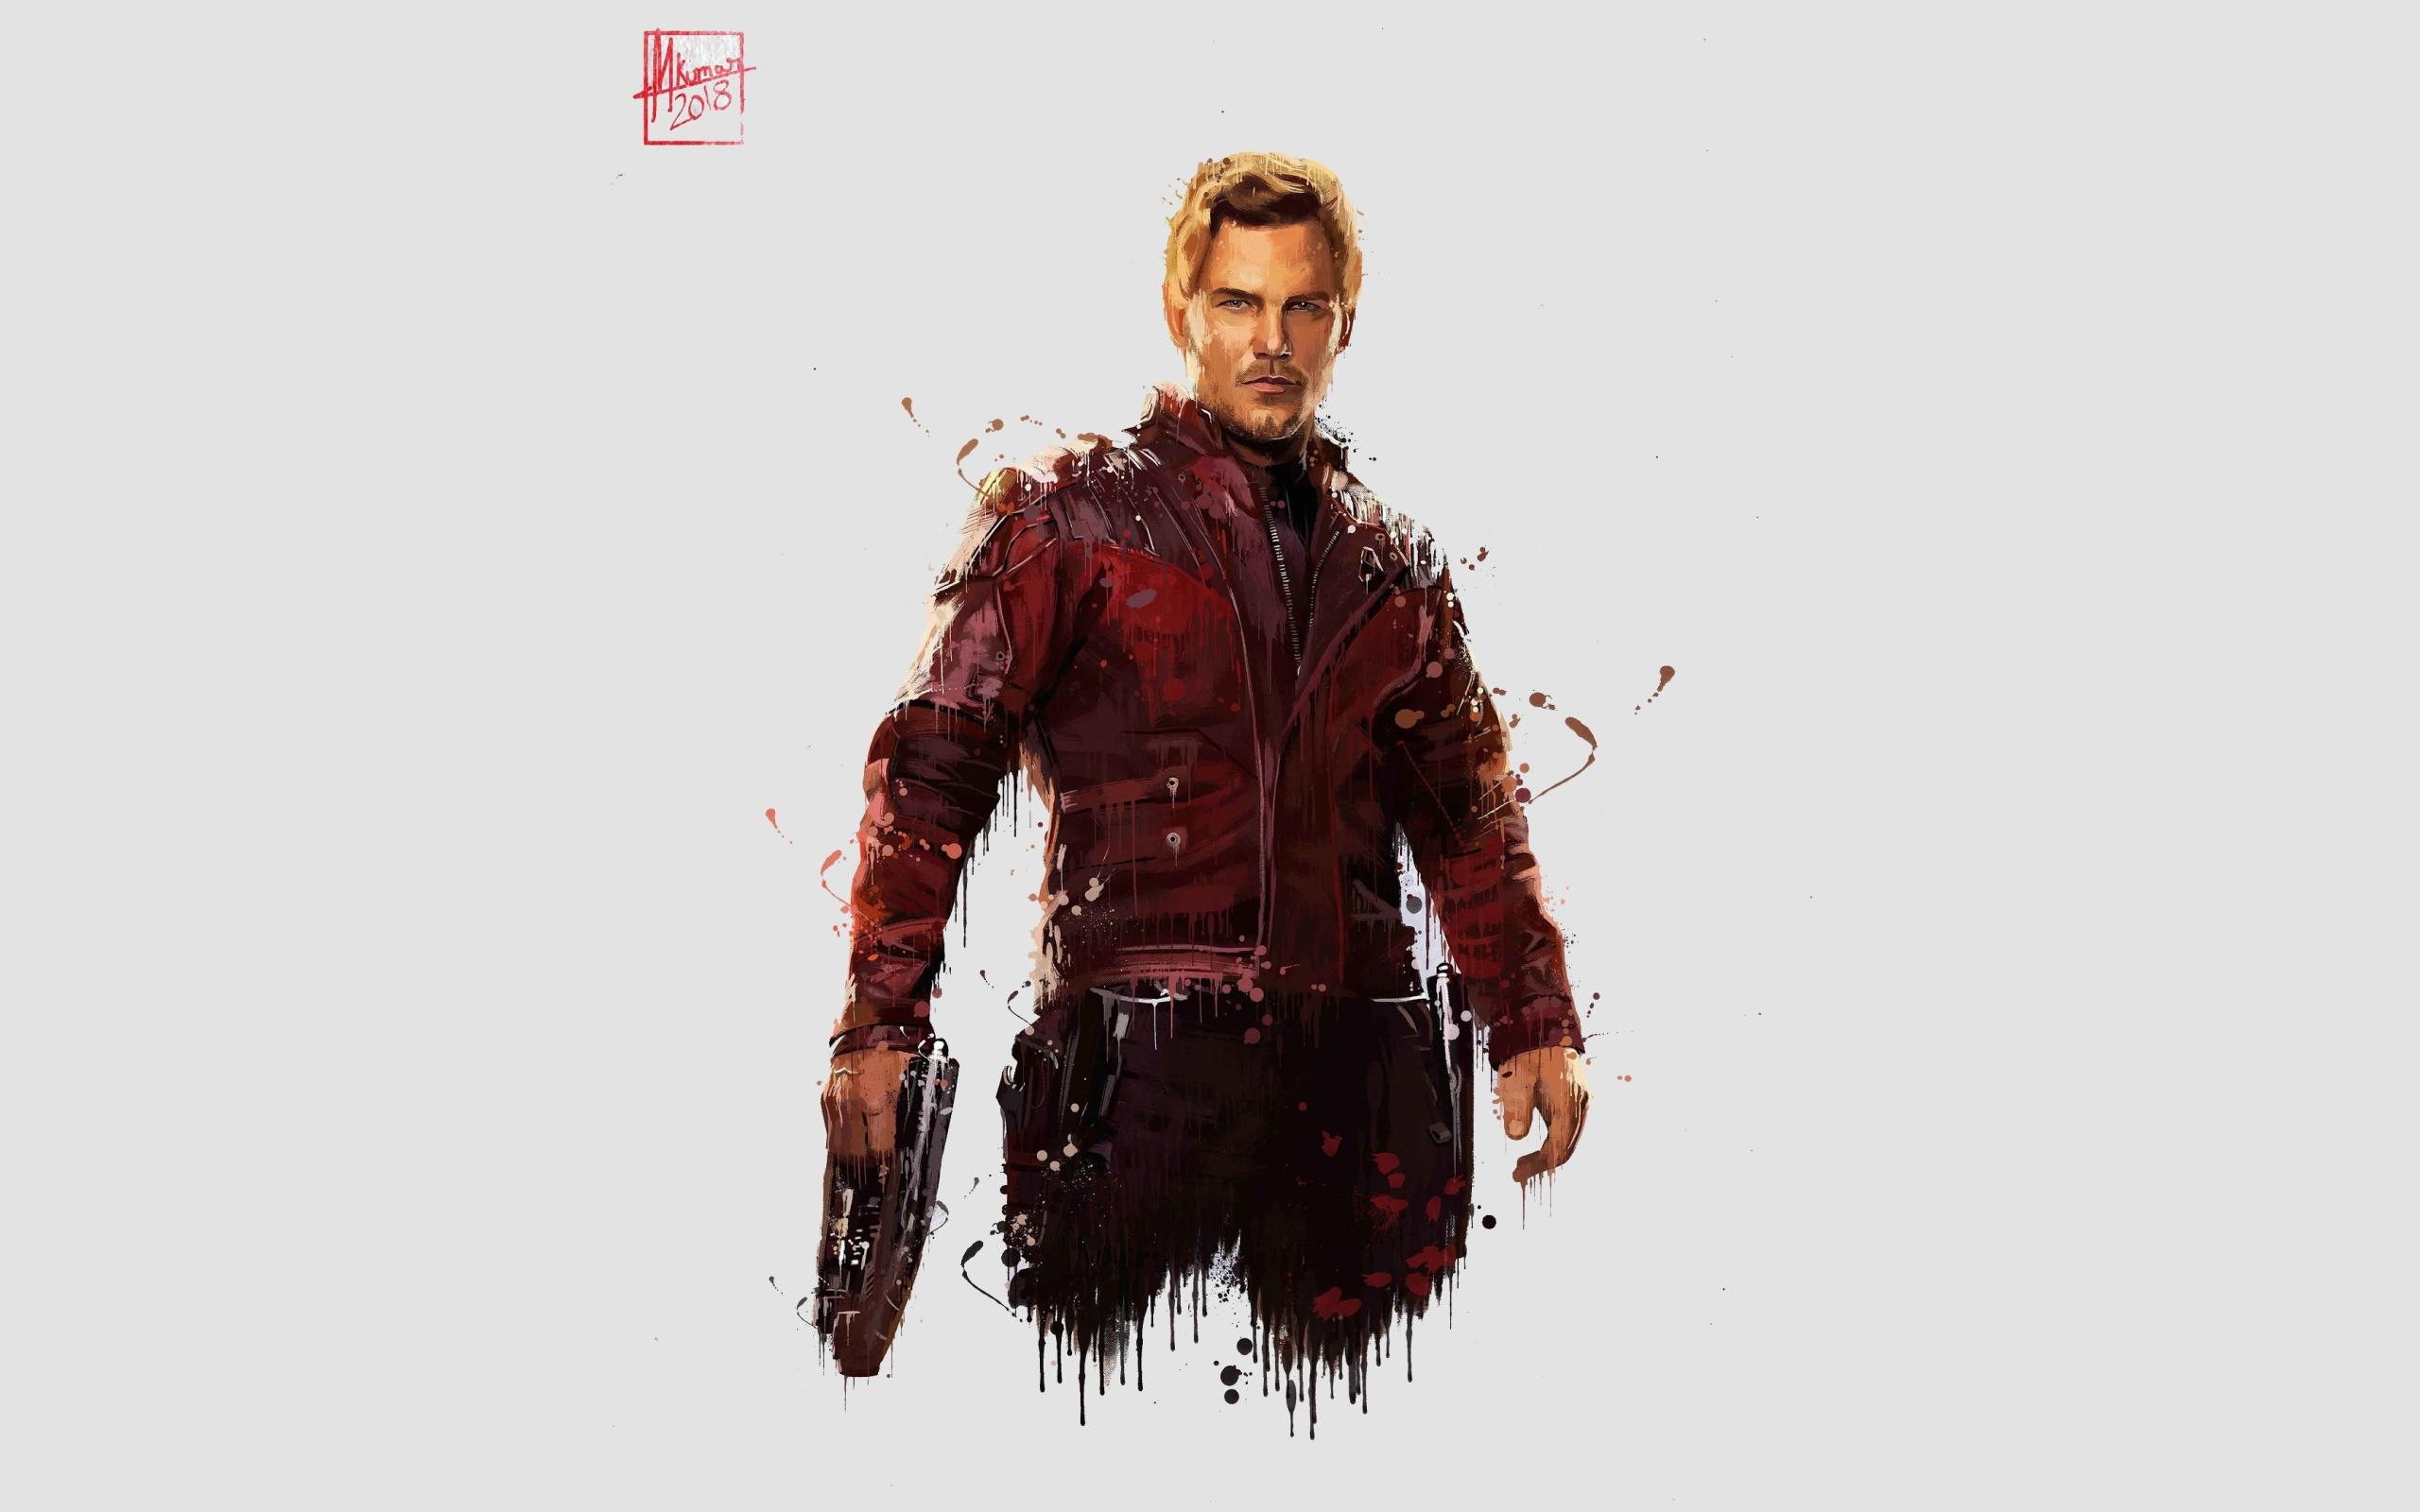 Wallpaper of Avengers Infinity War Chris Pratt Marvel Comics 2560x1600